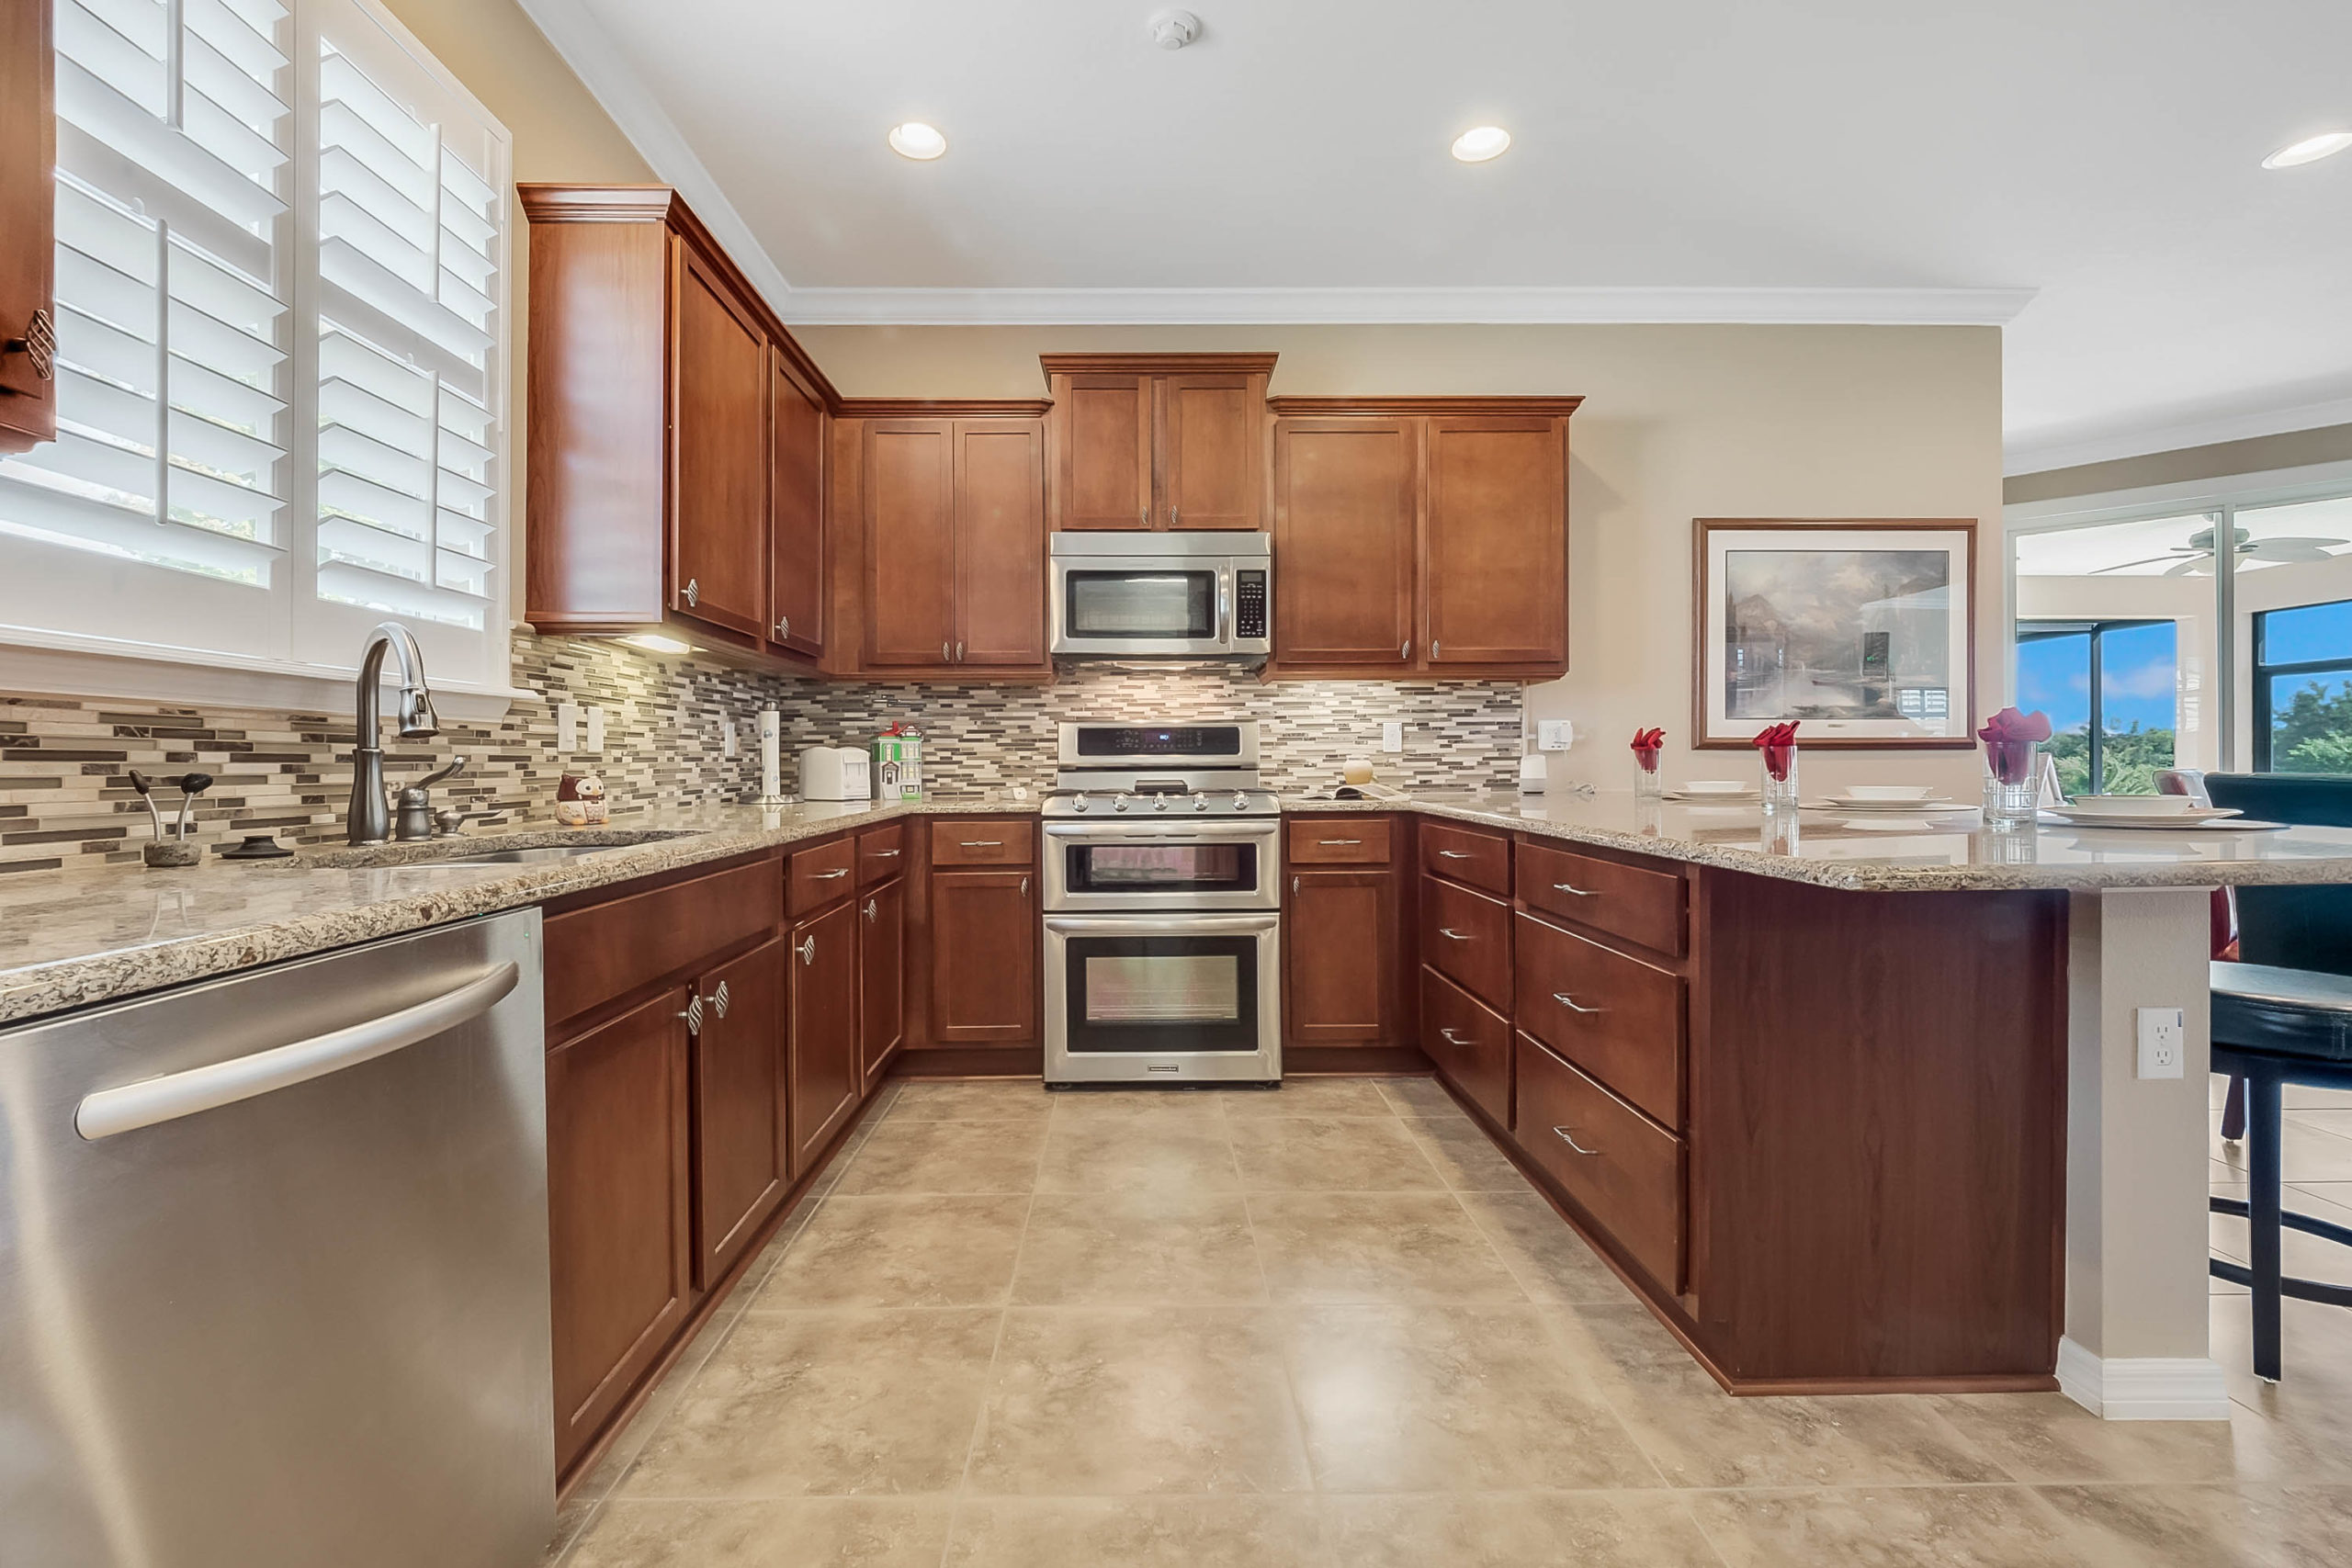 123 Cupania Ct, Groveland, FL 34736